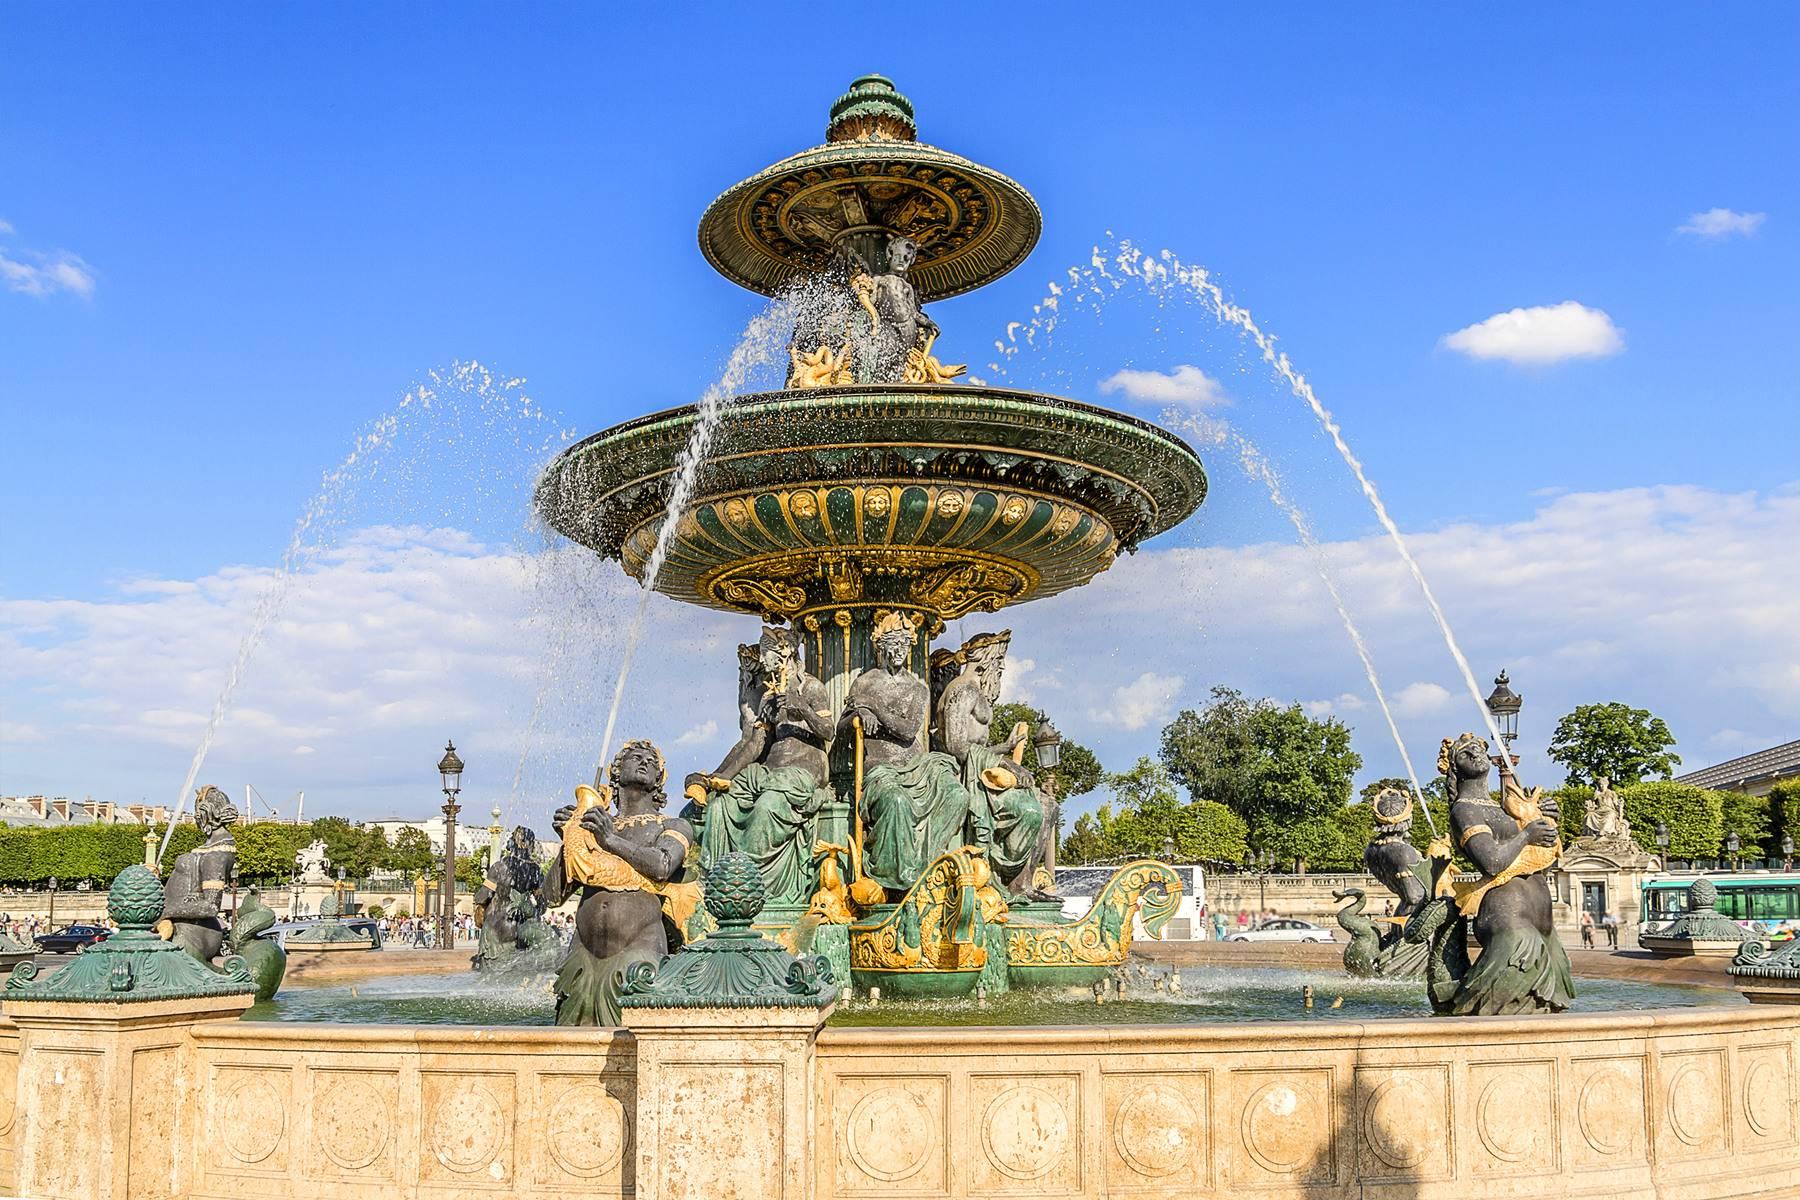 Paris City Tour + Seine River Cruise + Eiffel Tower Ticket